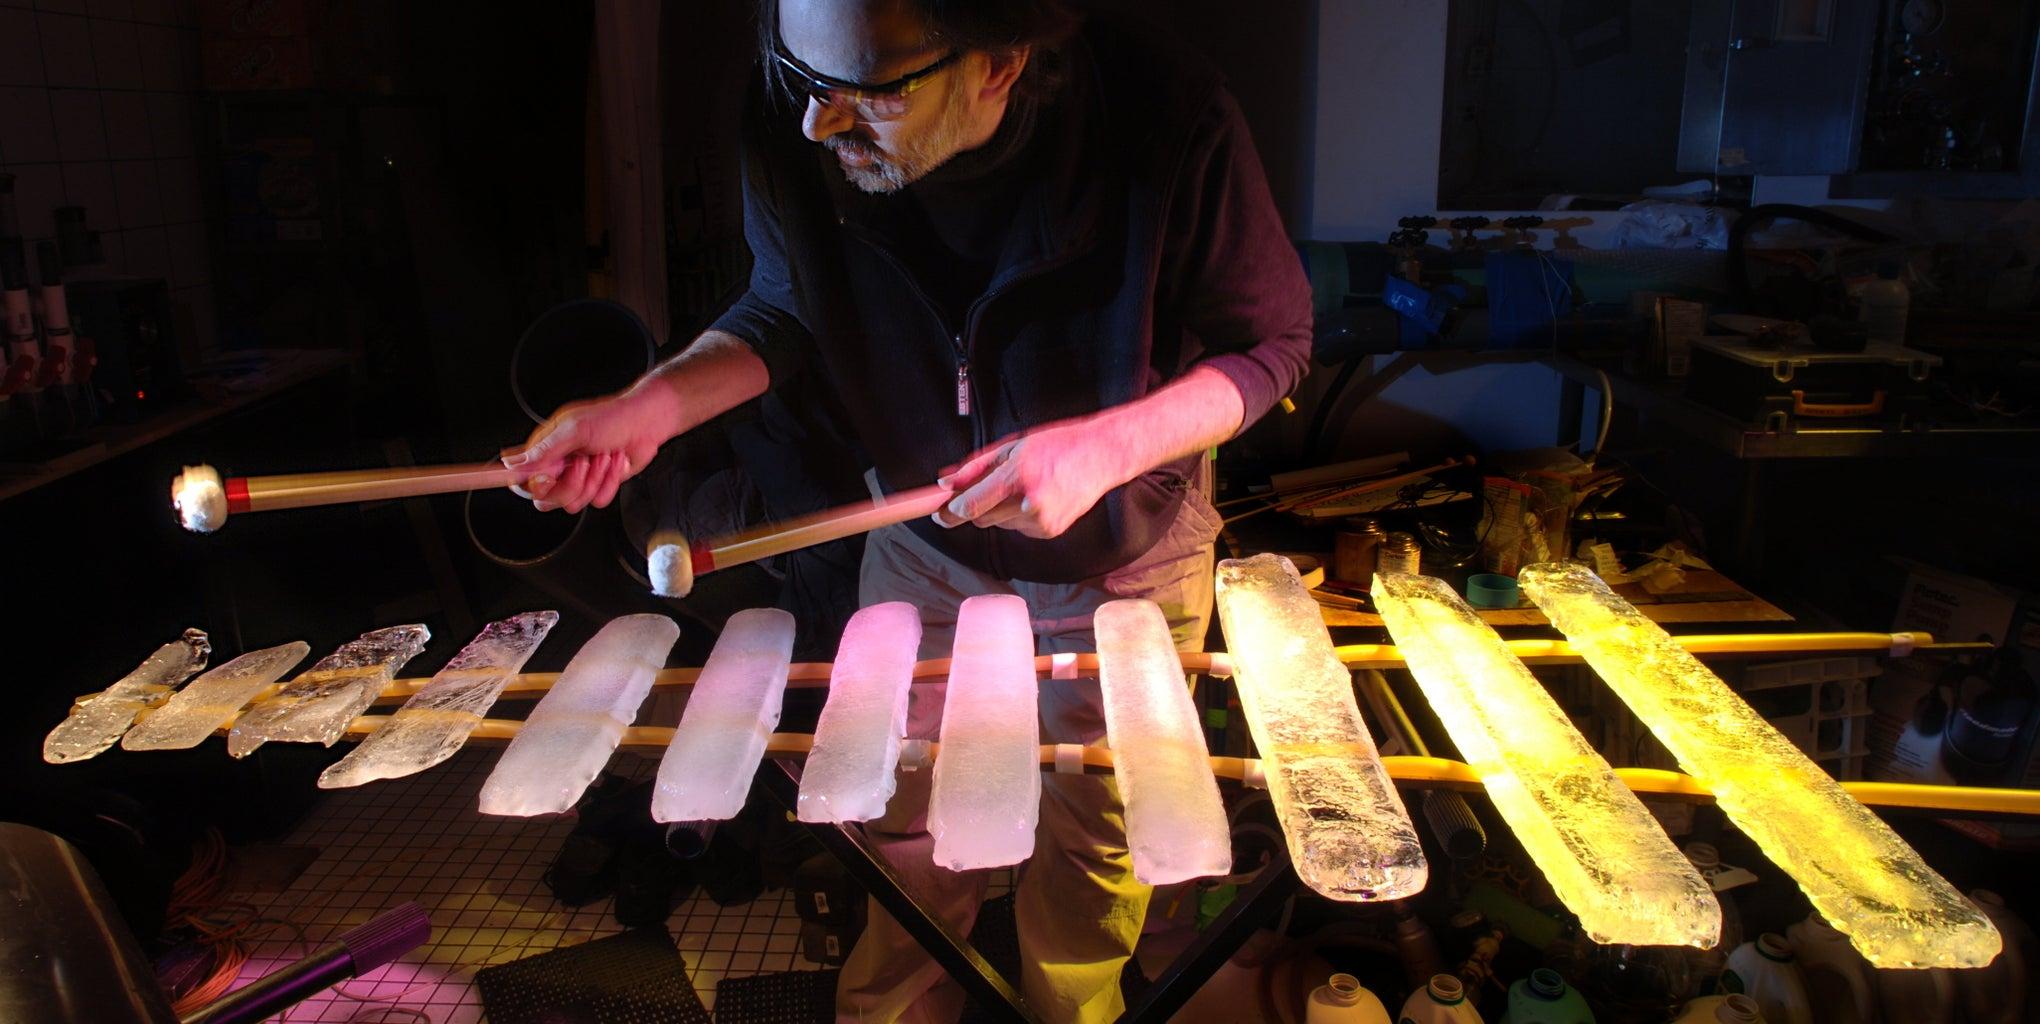 Pagophone (like Xylophone But Ice Instead of Wood)